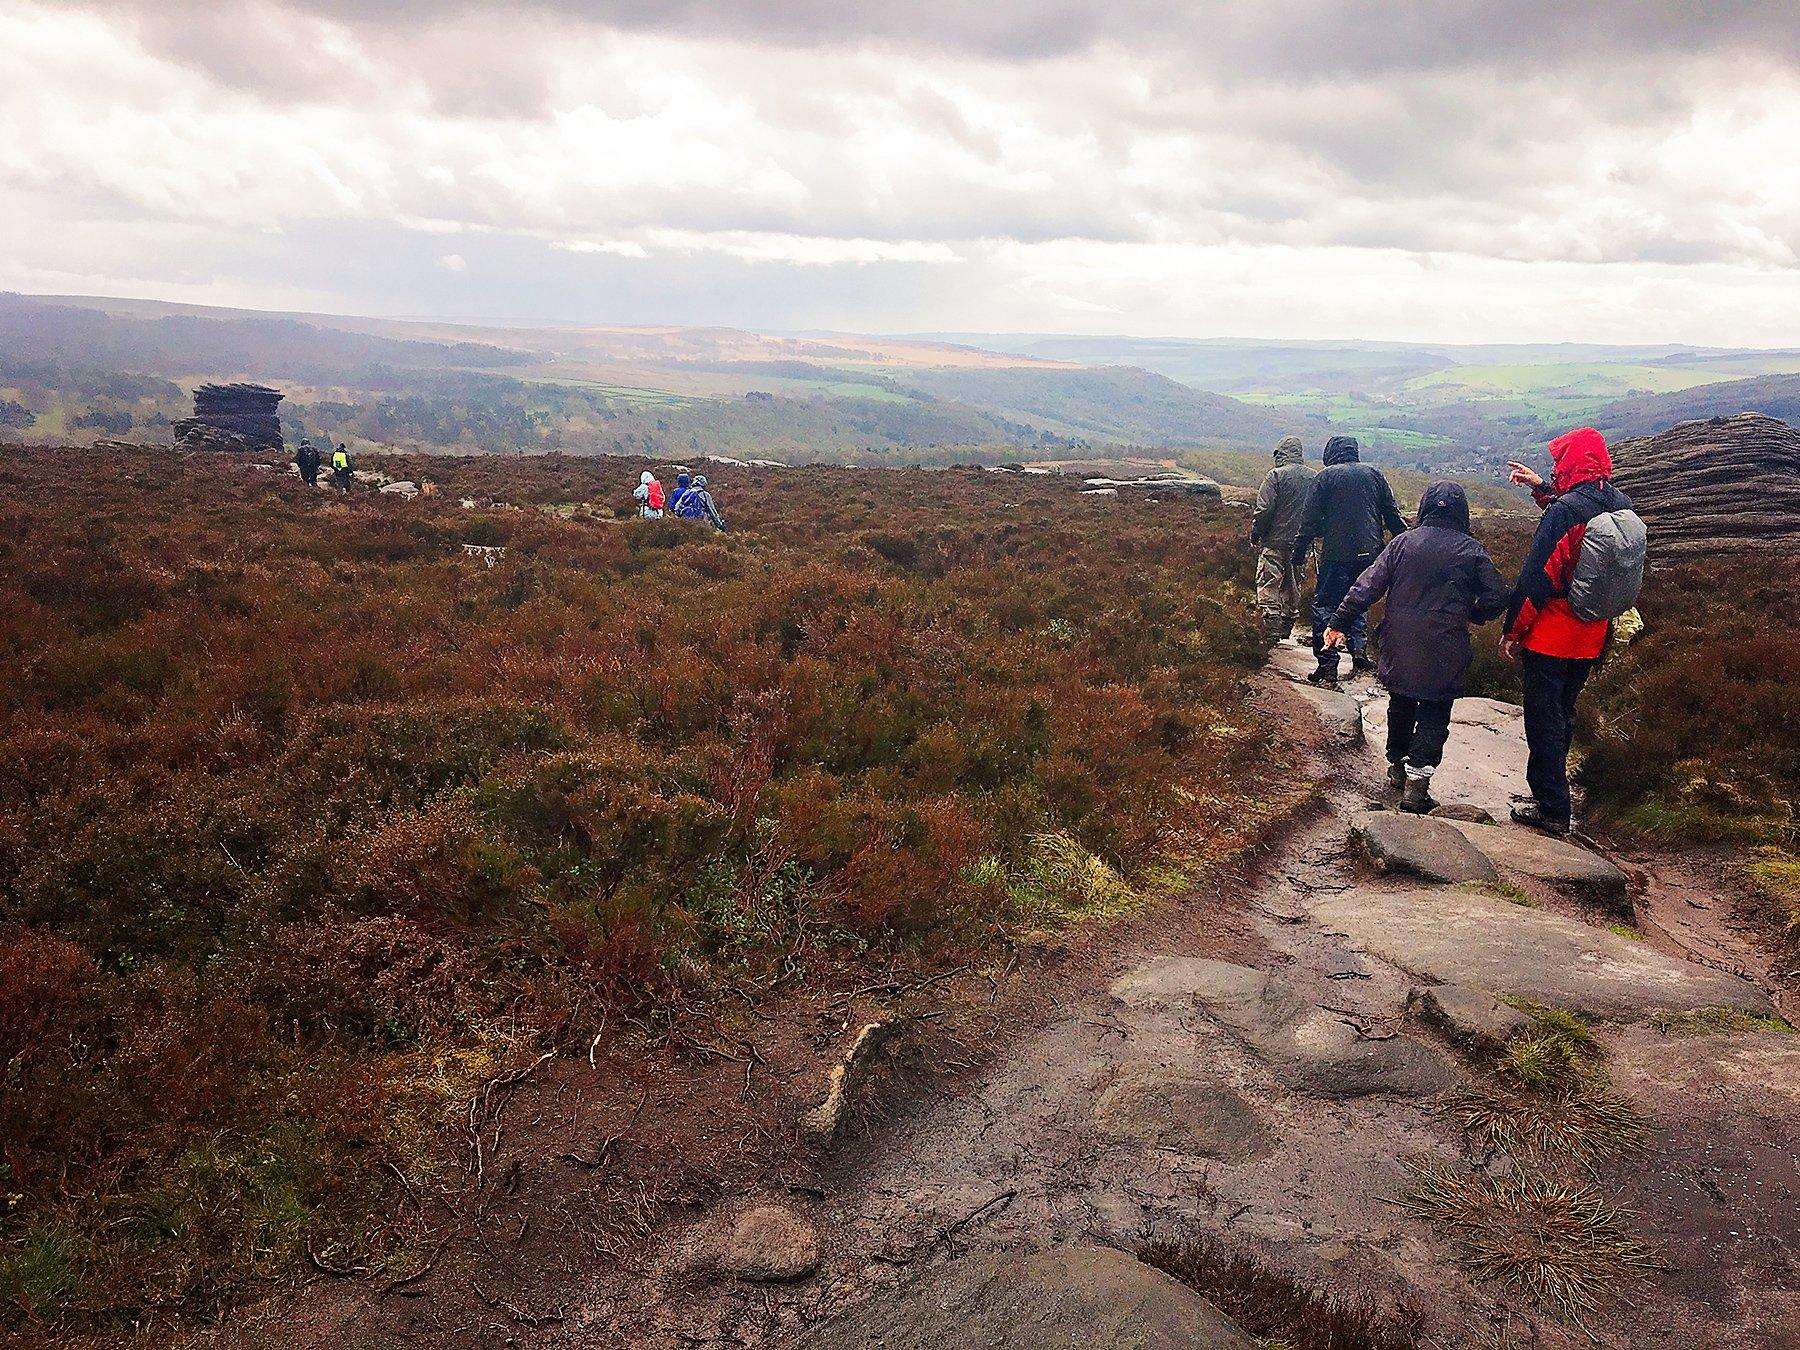 Rainy Longshaw guided walk